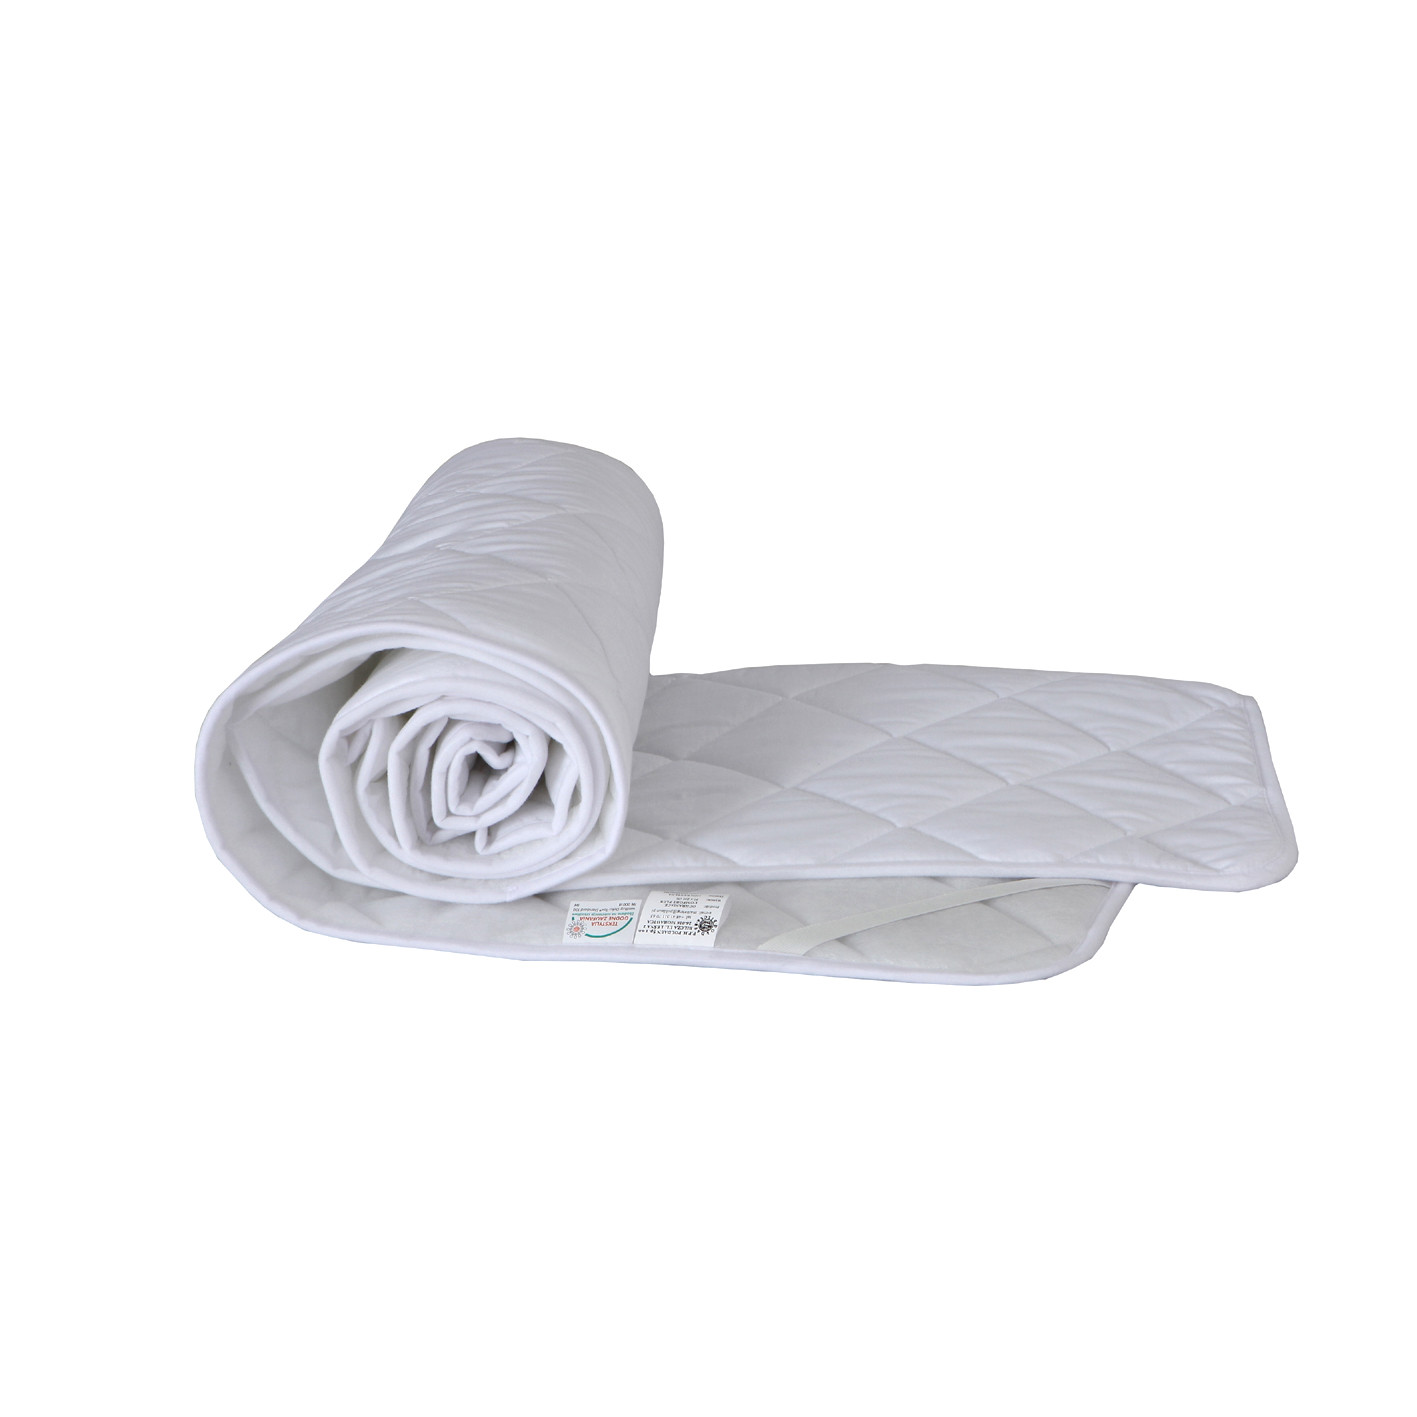 Ochraniacz na materac Comfort Plus 160x200